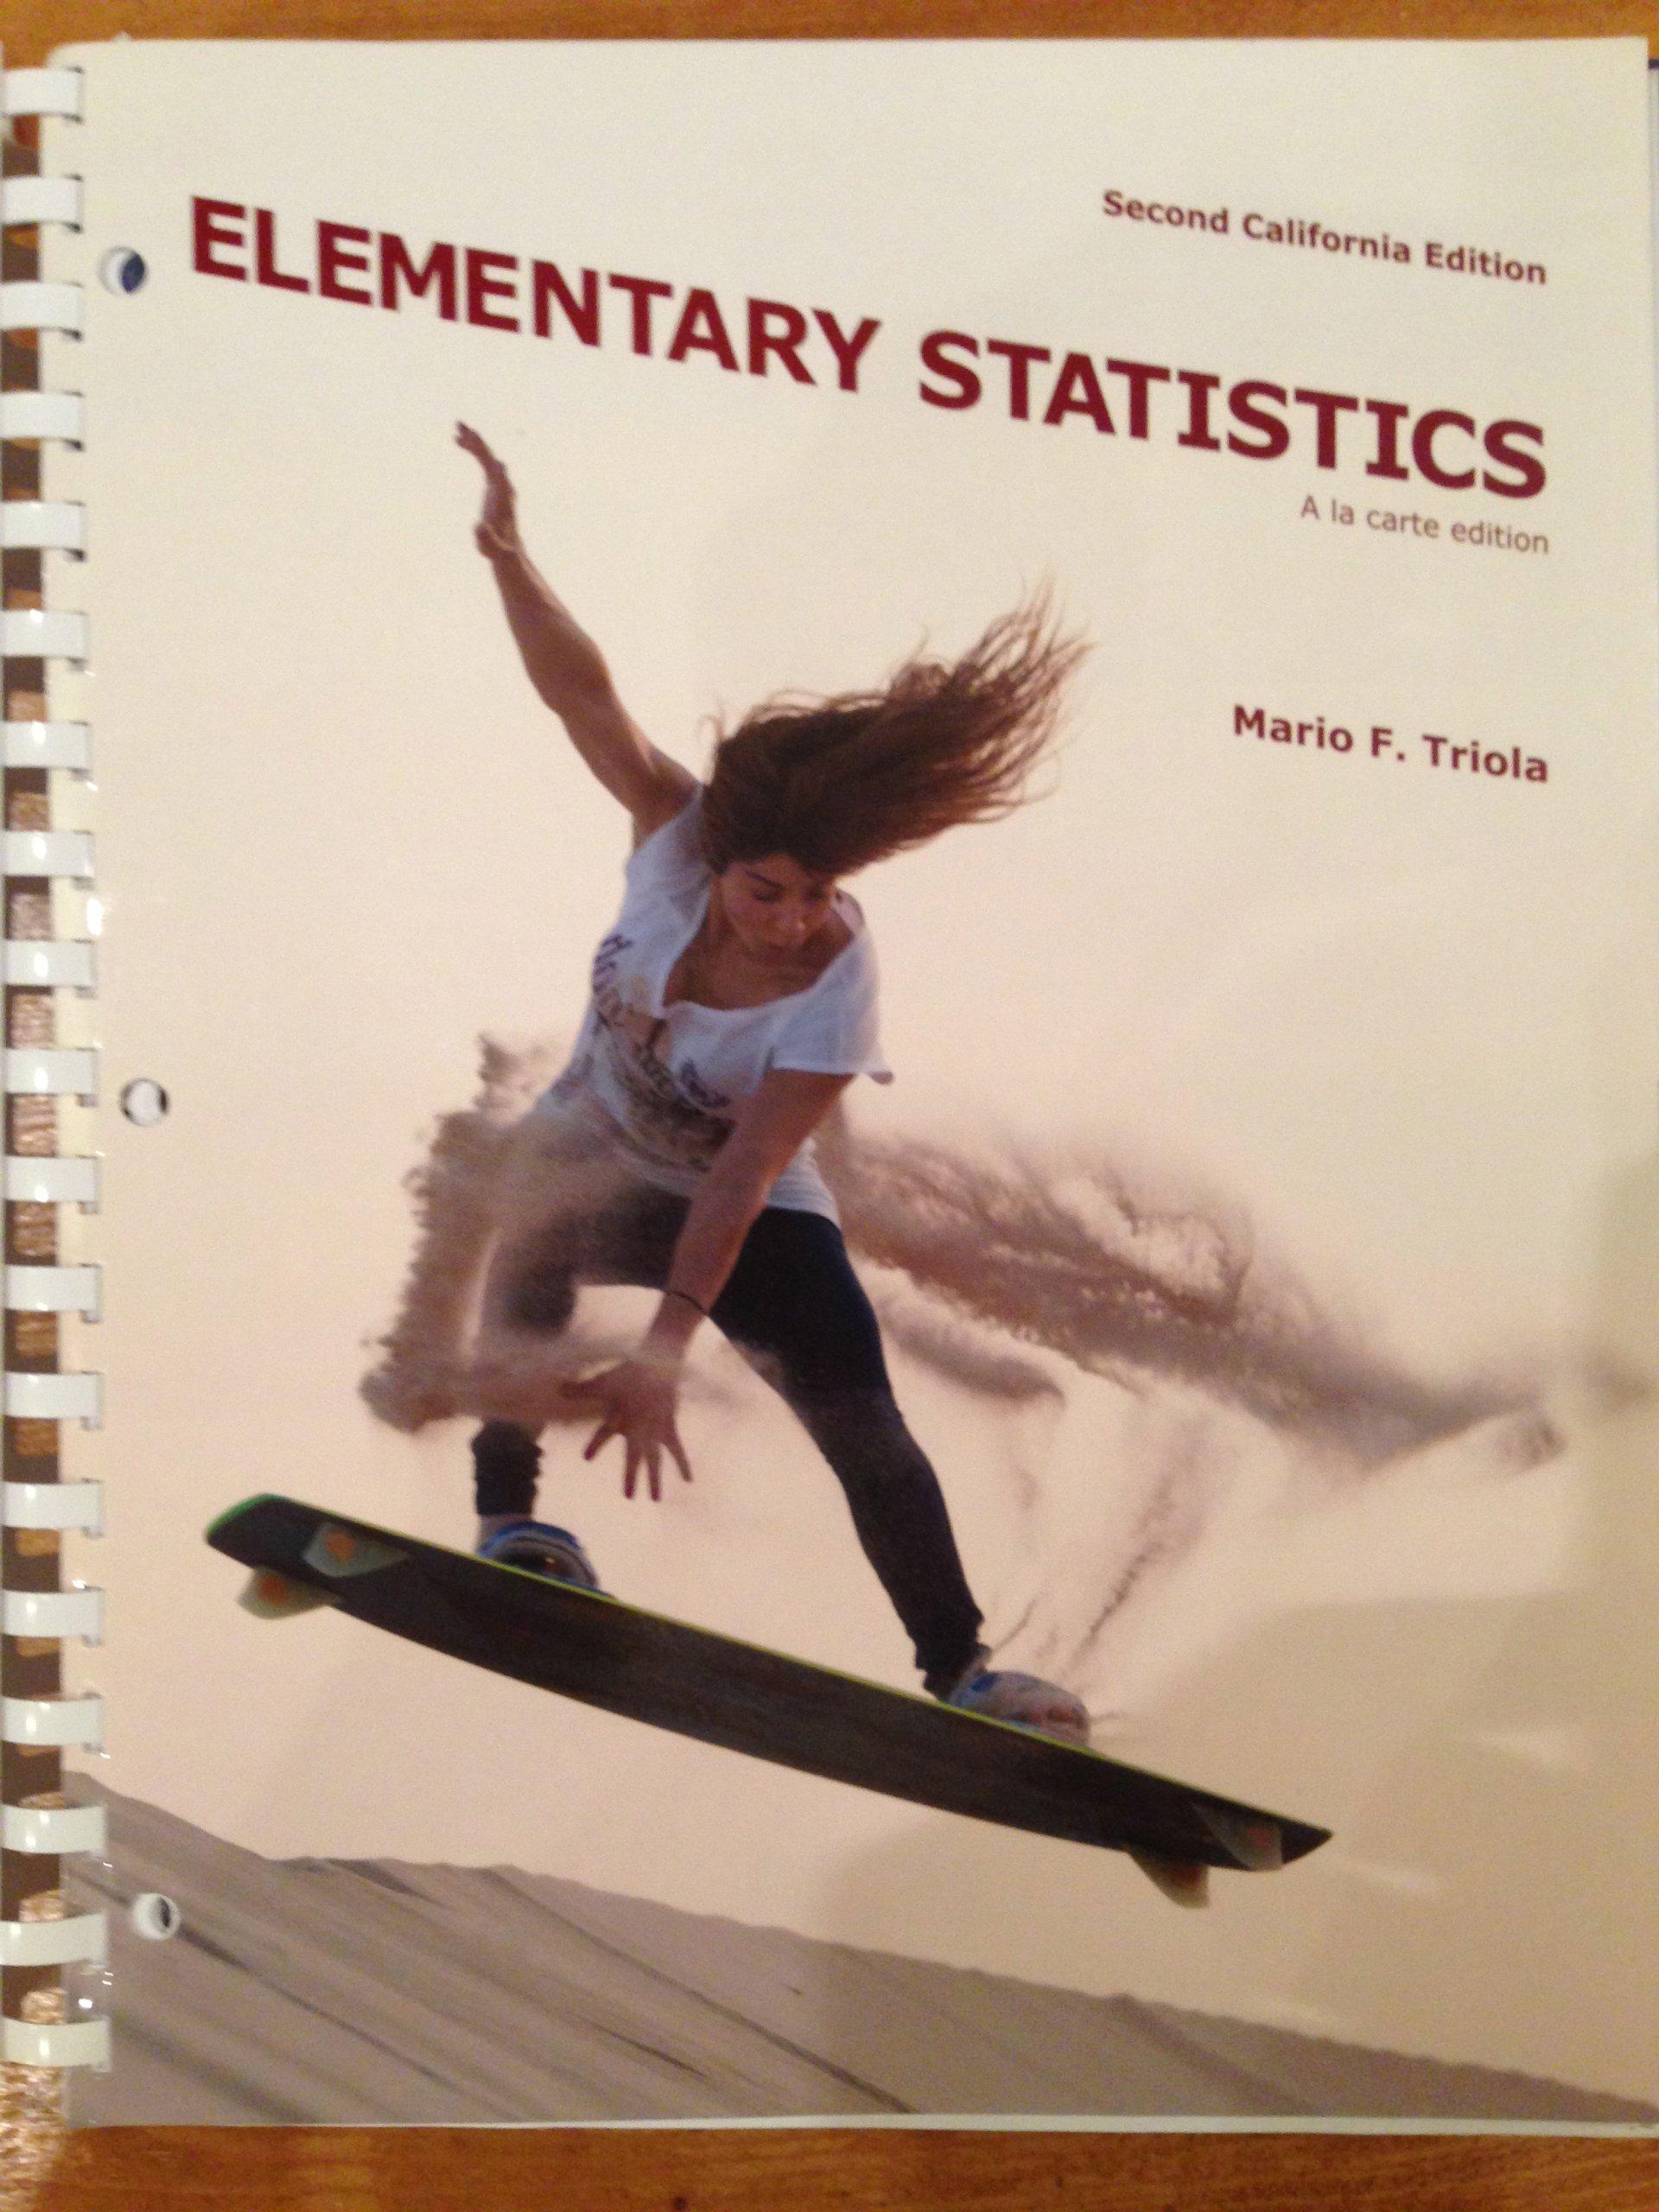 Elementary statistics mario triola pdf dolapgnetband elementary statistics second california edition mario f triola fandeluxe Images